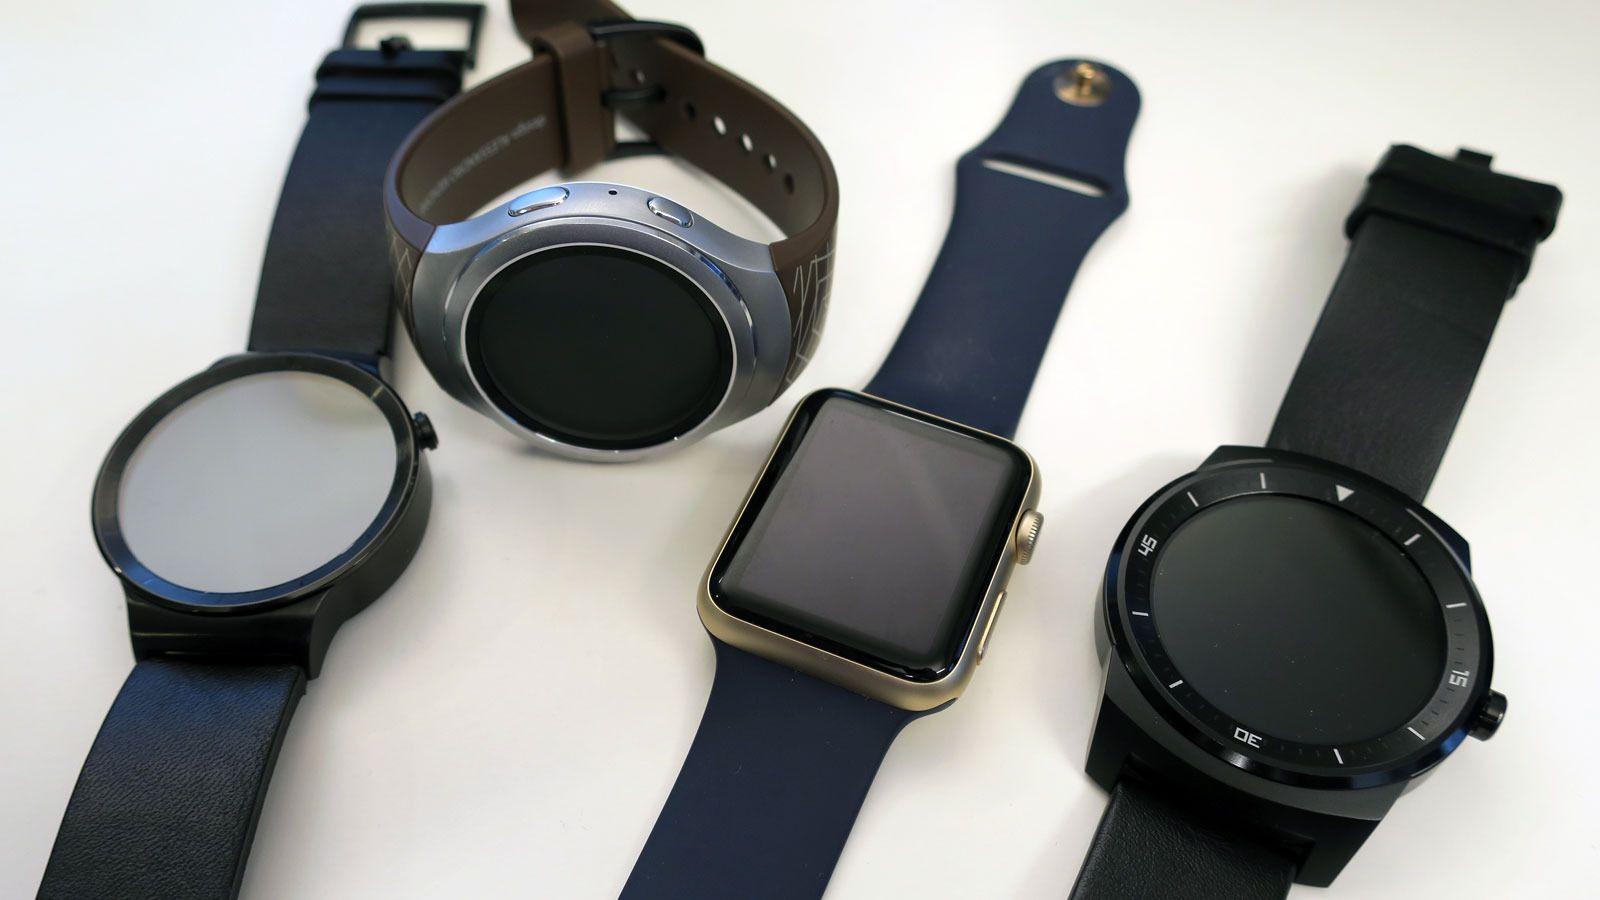 Fra venstre til høyre: Huawei Watch, Samsung Gear S2, Apple Watch og LG Gwatch R. . Foto: Espen Irwing Swang, Tek.no